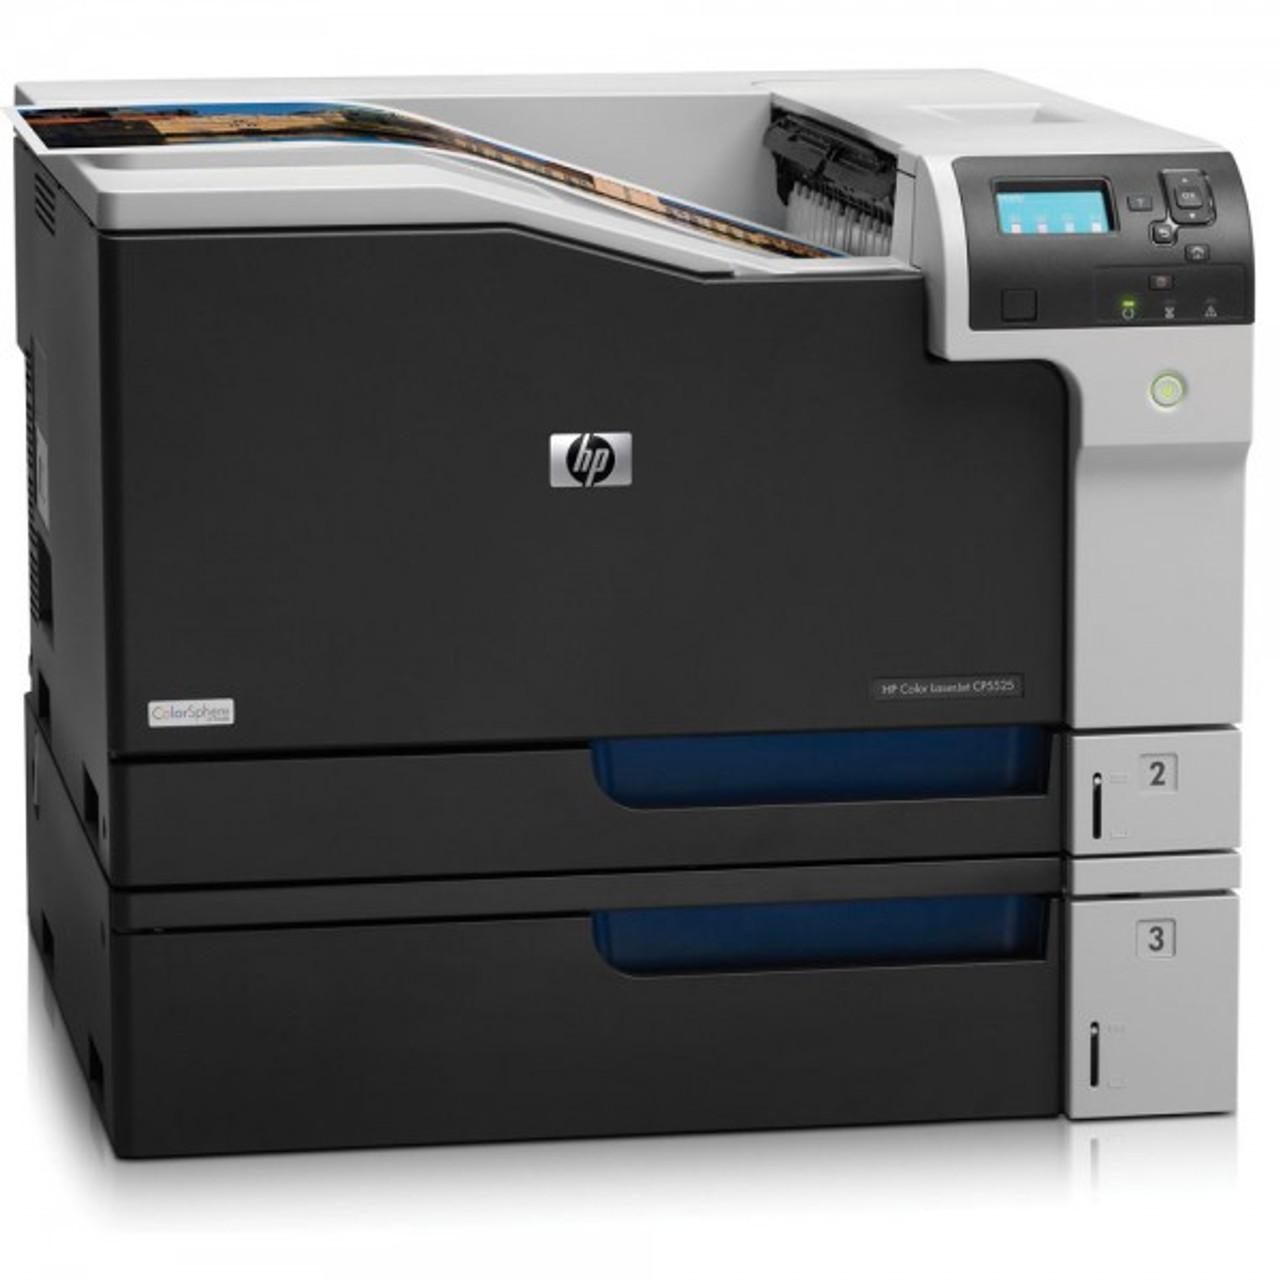 HP Color LaserJet CP5525DN - CE708A - HP Laser Printer for sale